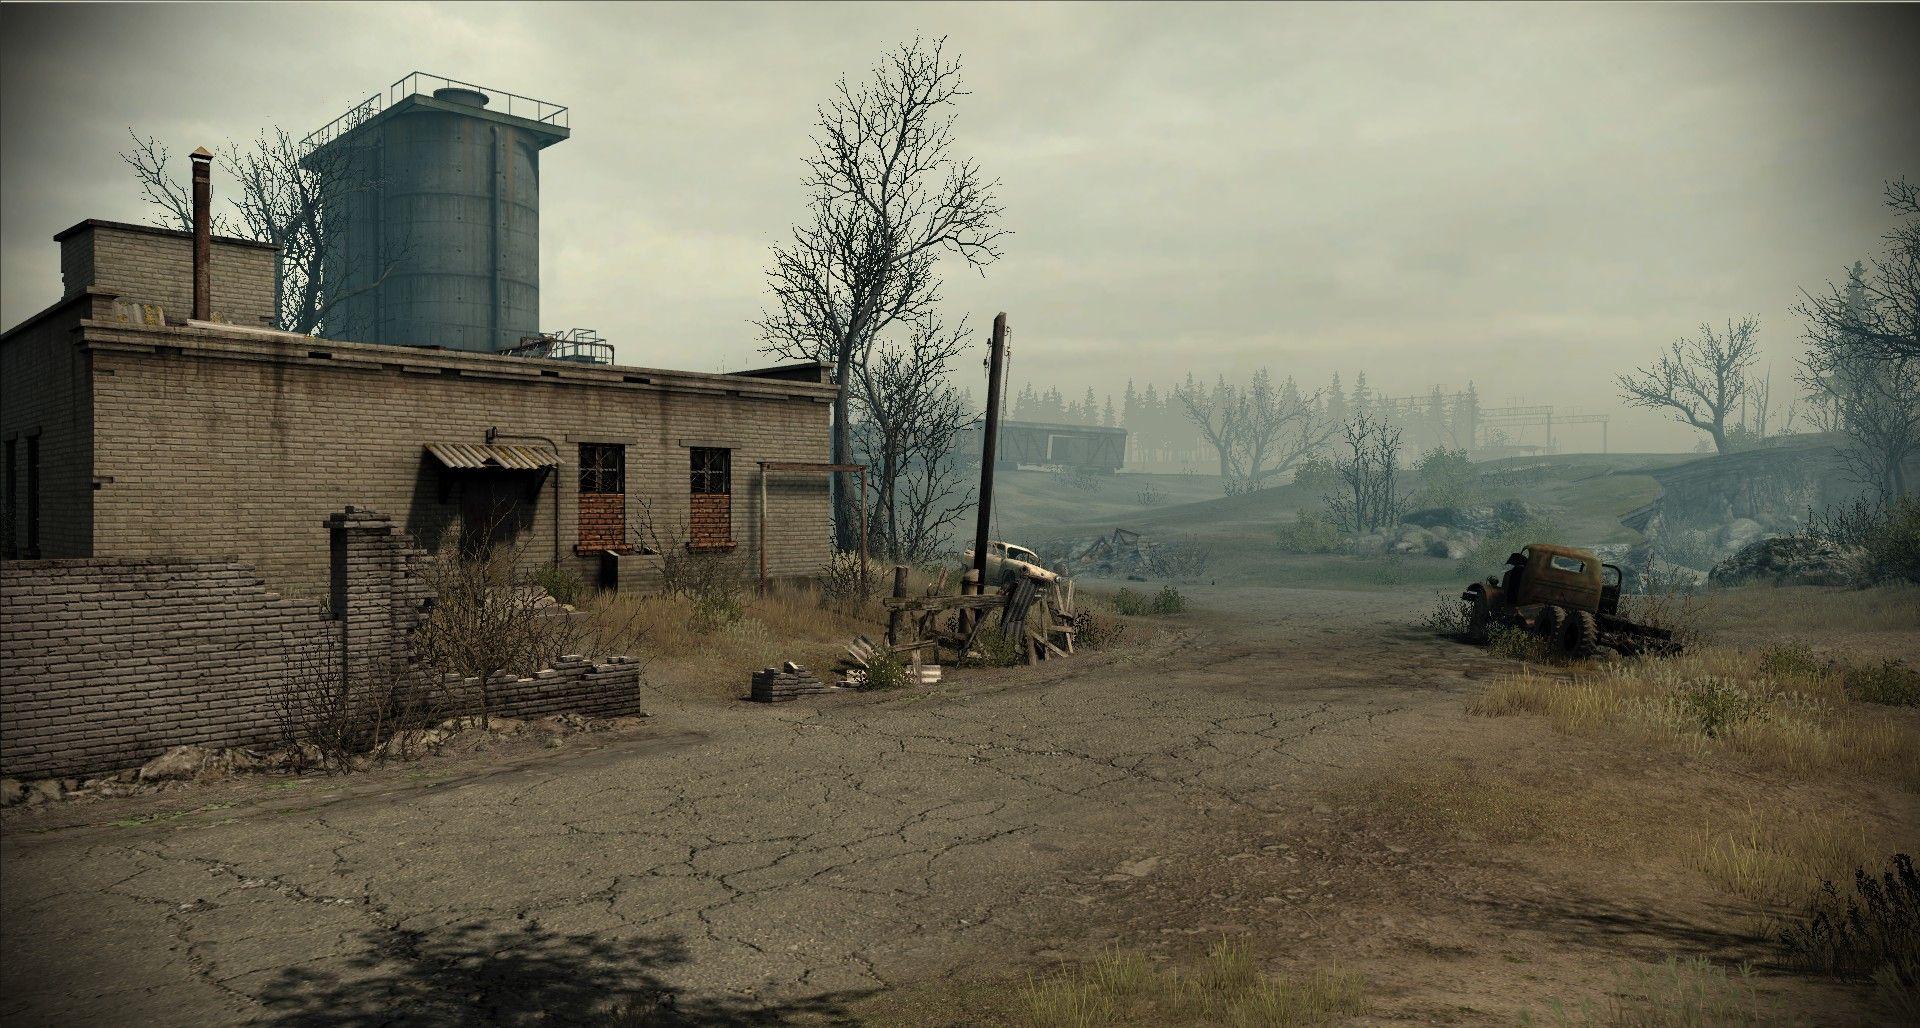 Obrázky z post-apokalyptického RPG Novy Soyuz 69421